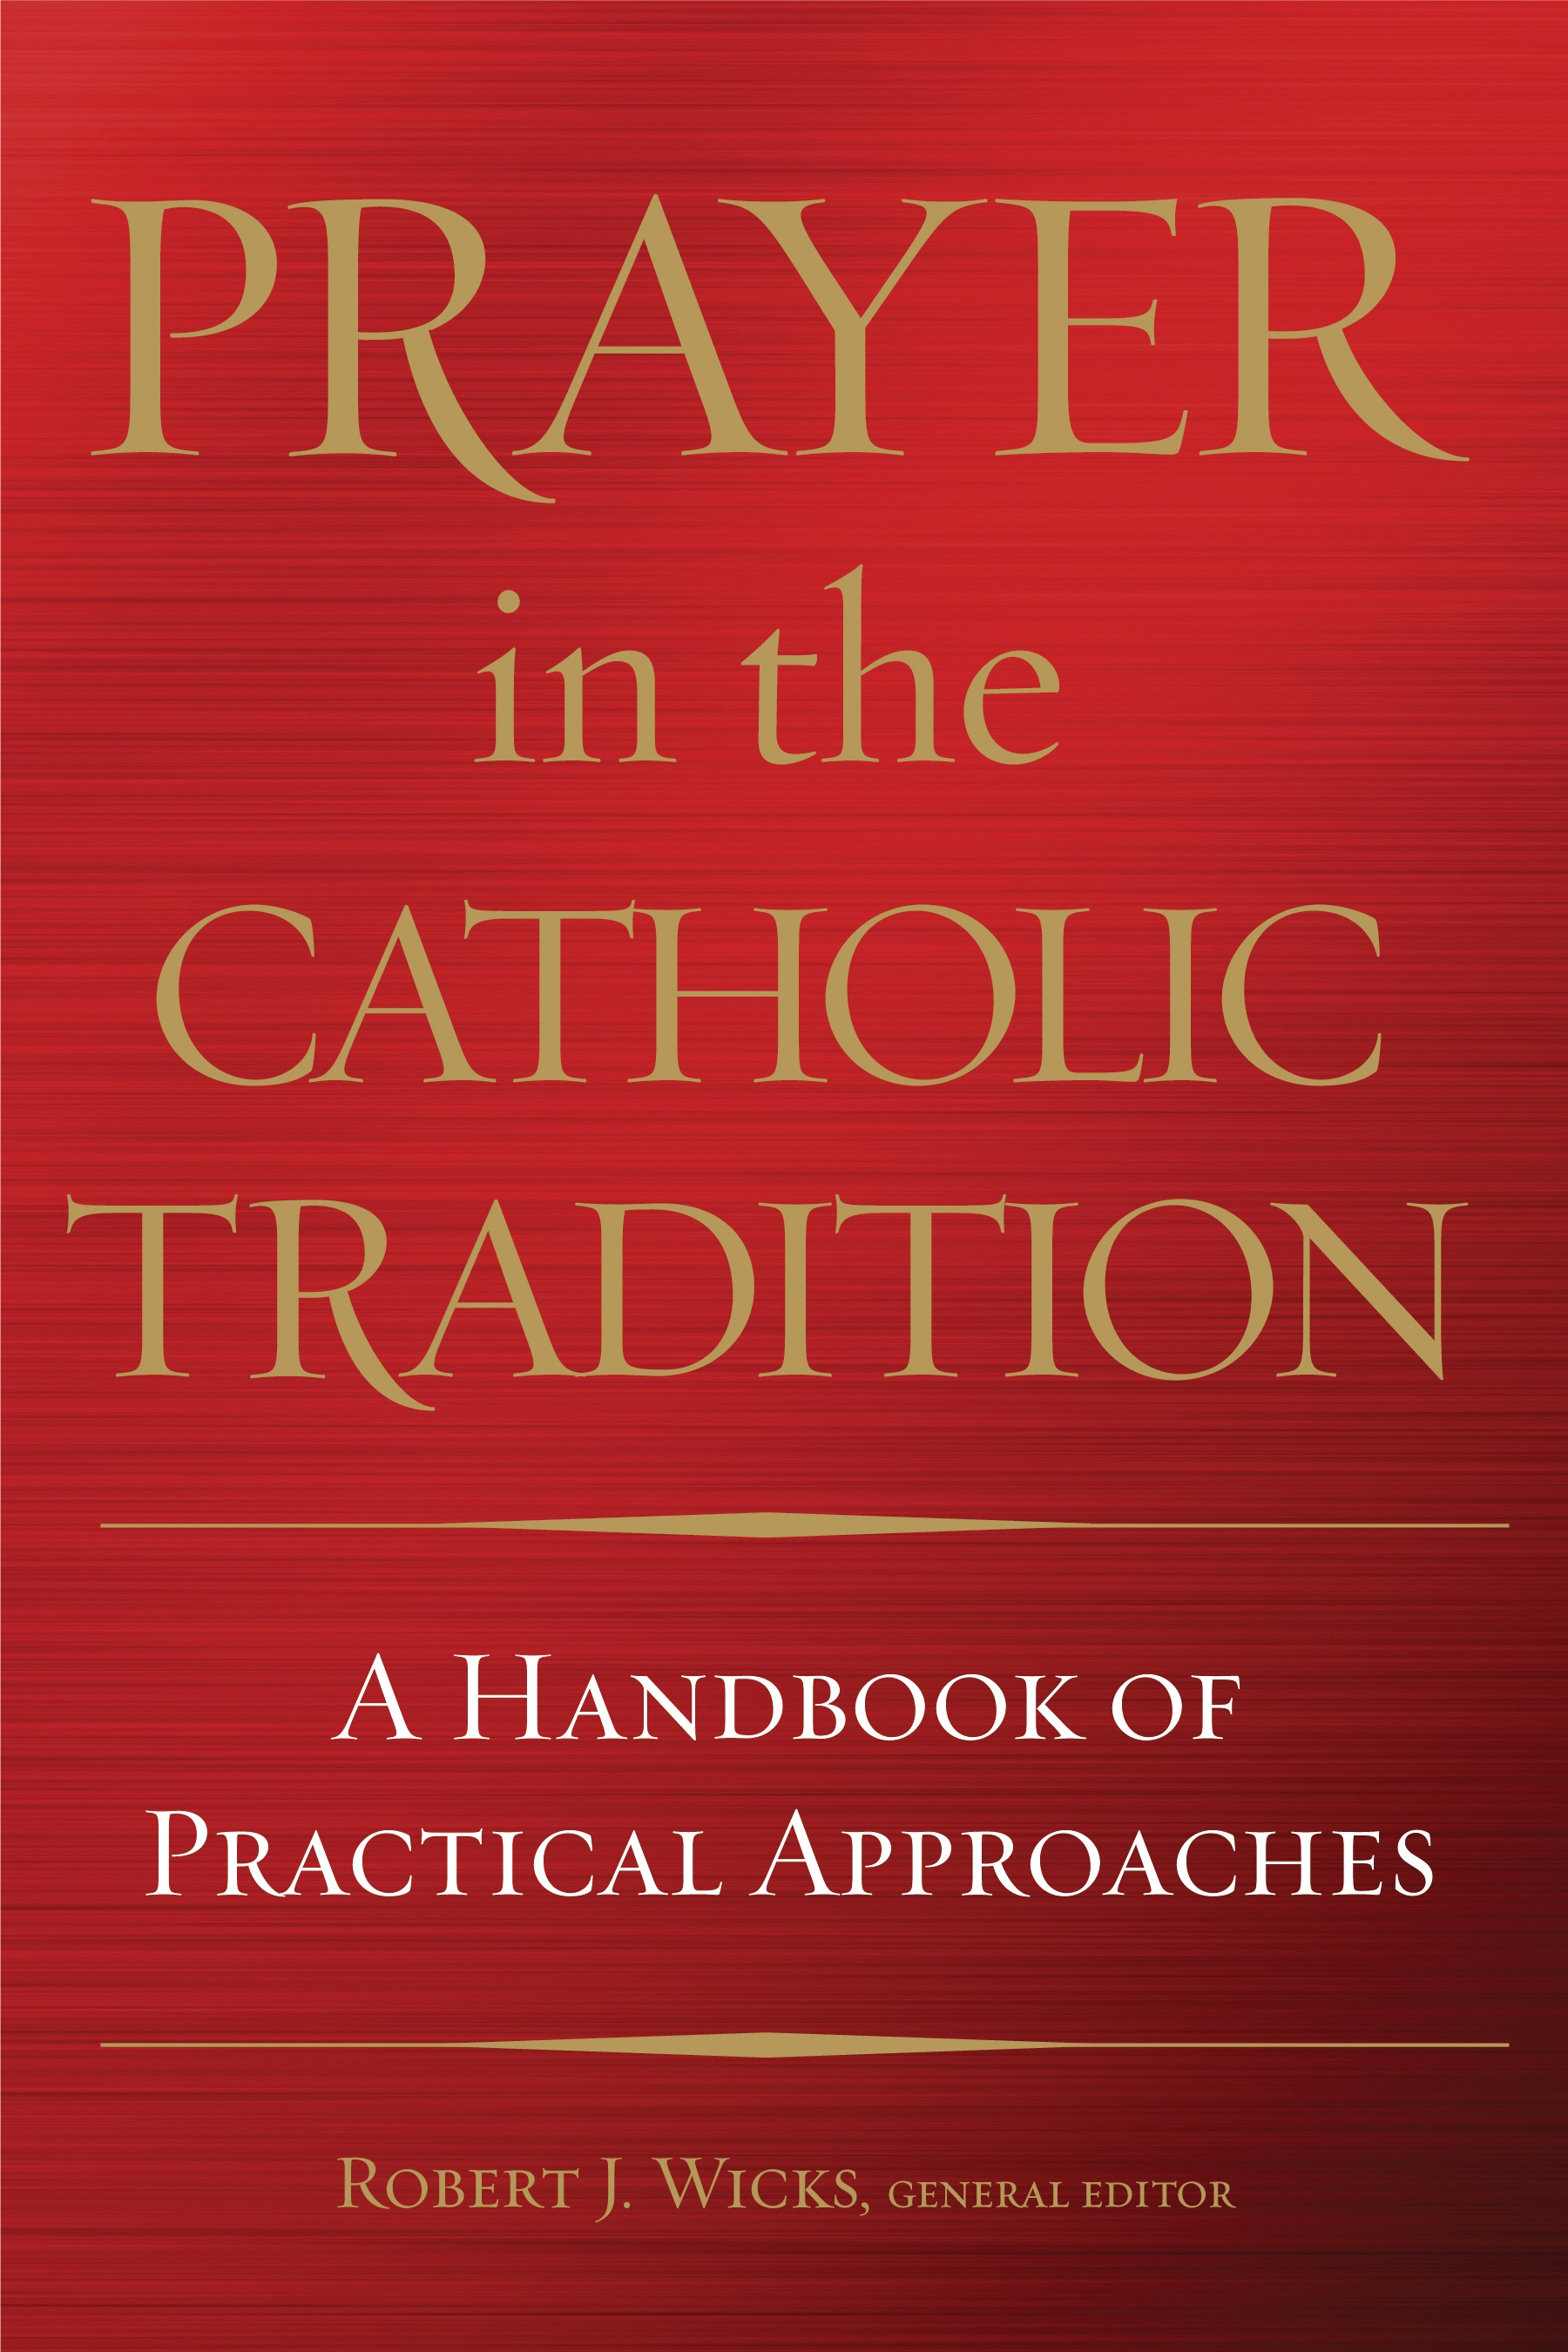 PrayerintheCatholicTradition.jpg